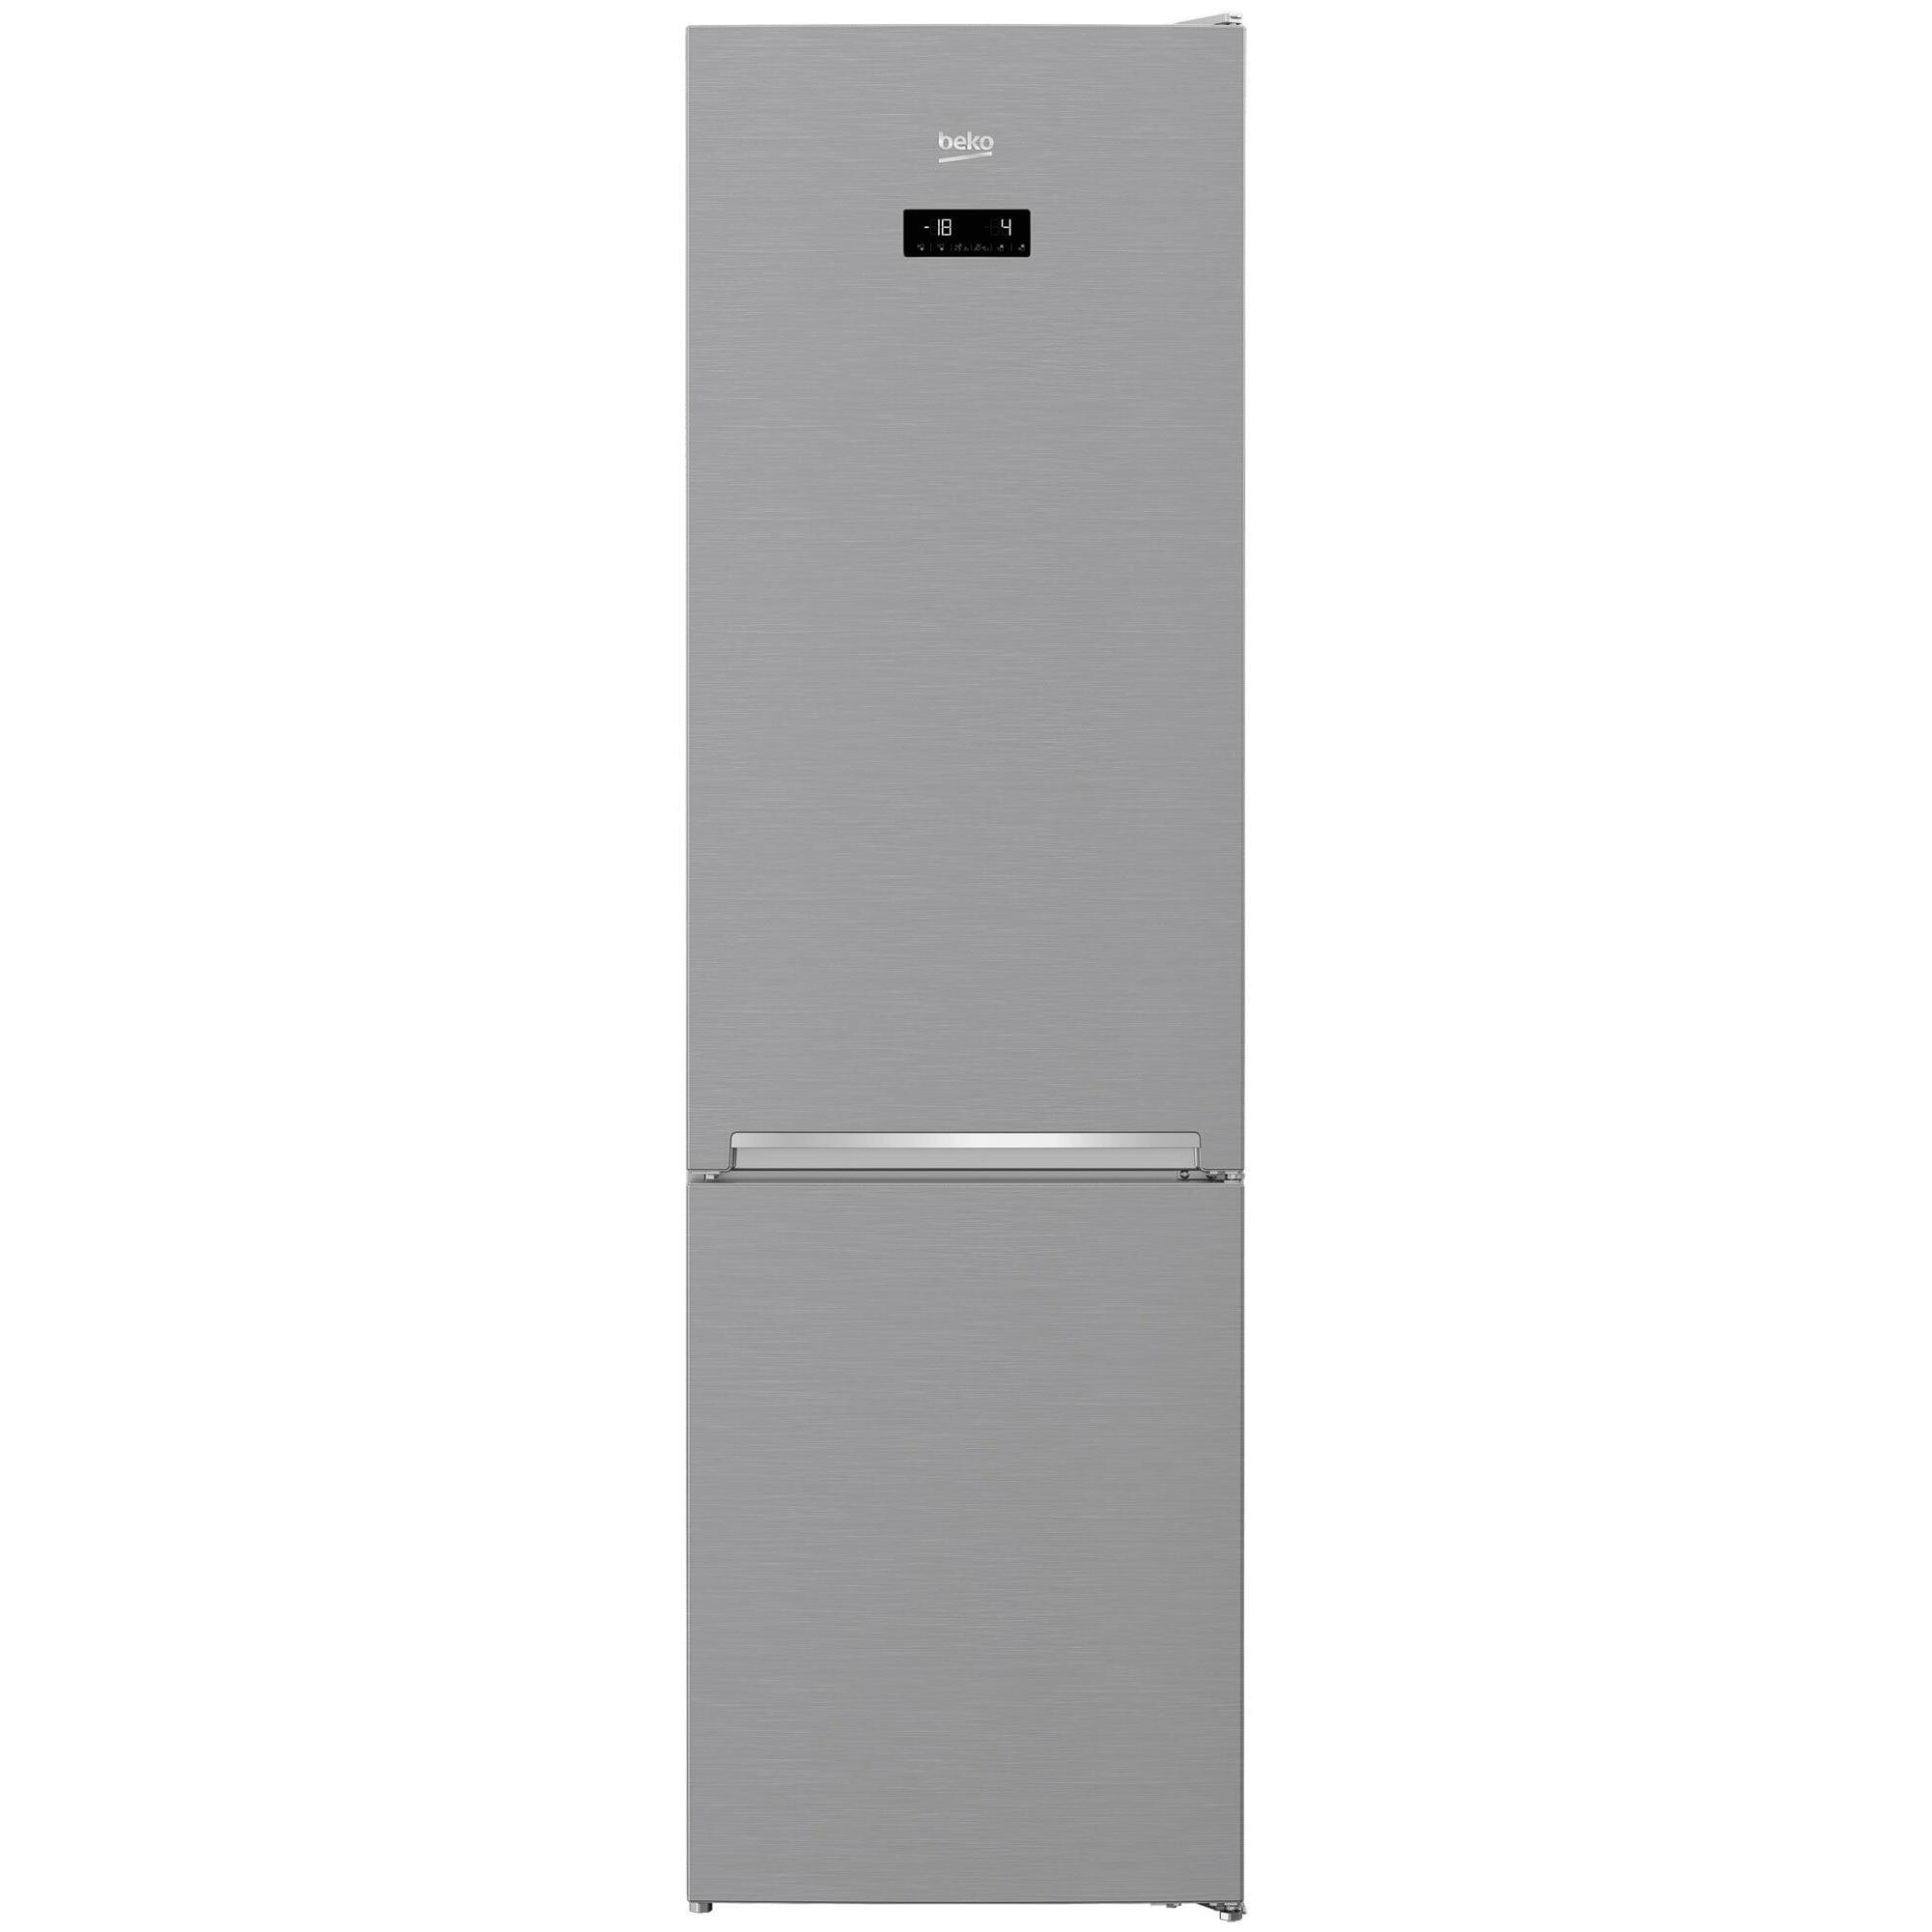 Fotografie Combina frigorifica Beko RCNA406E40XB, 362 l, Clasa A+++, H 203 cm, NeoFrost Compartiment 0°C, Kitchen Fit, 203 cm, Argintiu